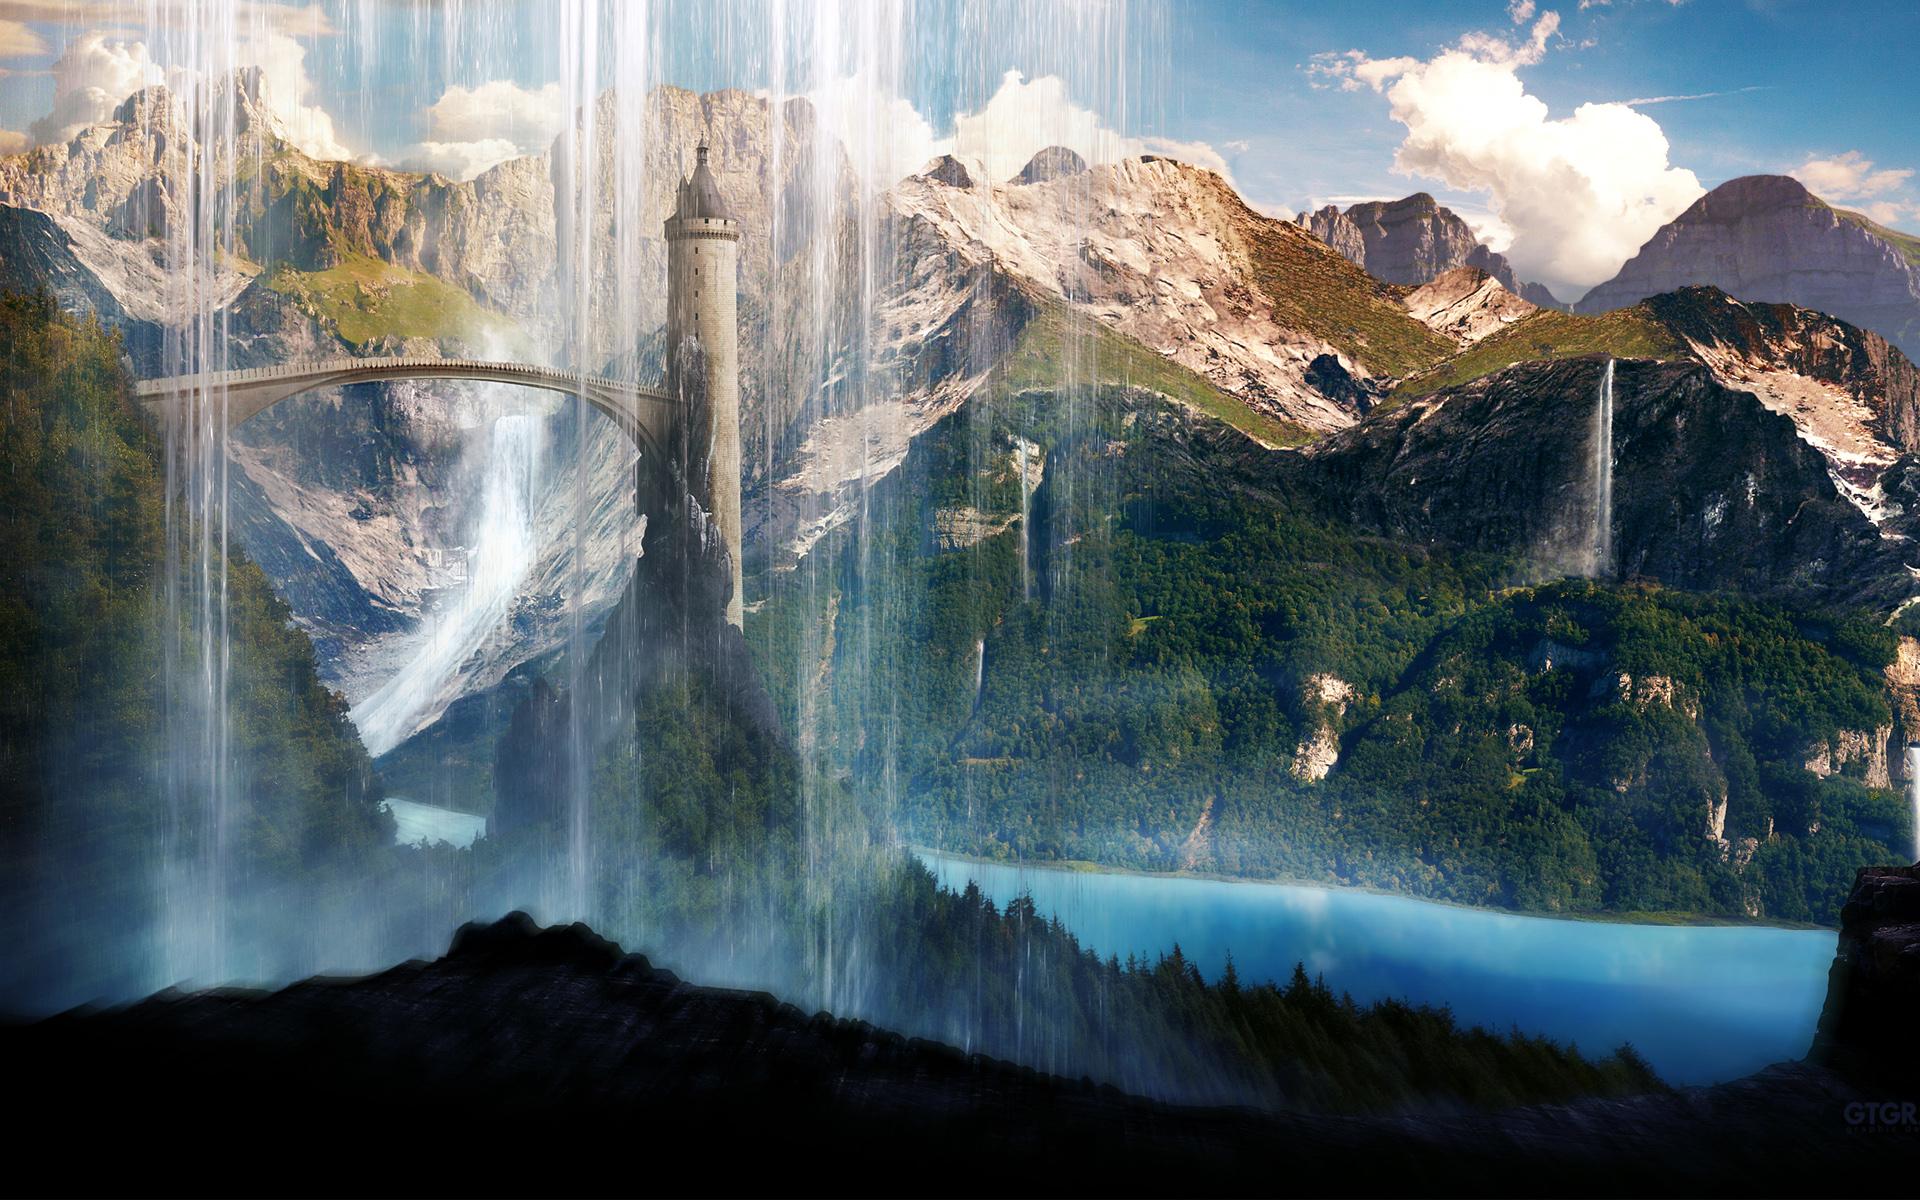 Free Desktop Wallpaper Anime Waterfalls Scenery Wallpapers Wallpapers Hd